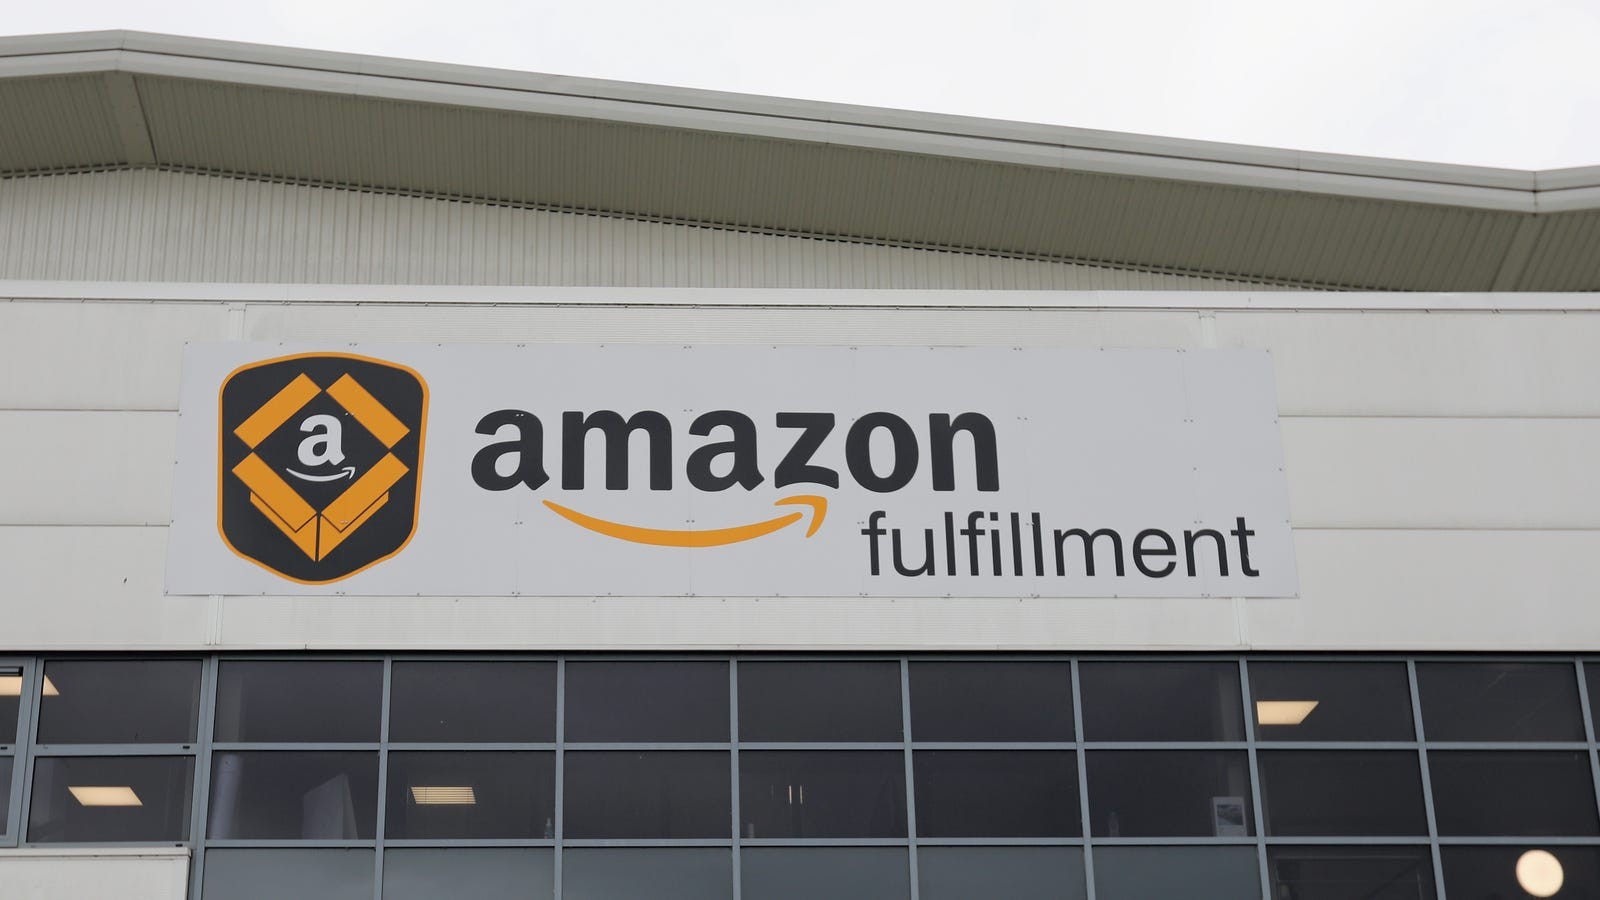 Here Are Some Ways Amazon's Practices Have Caught The Eye of Antitrust Regulators